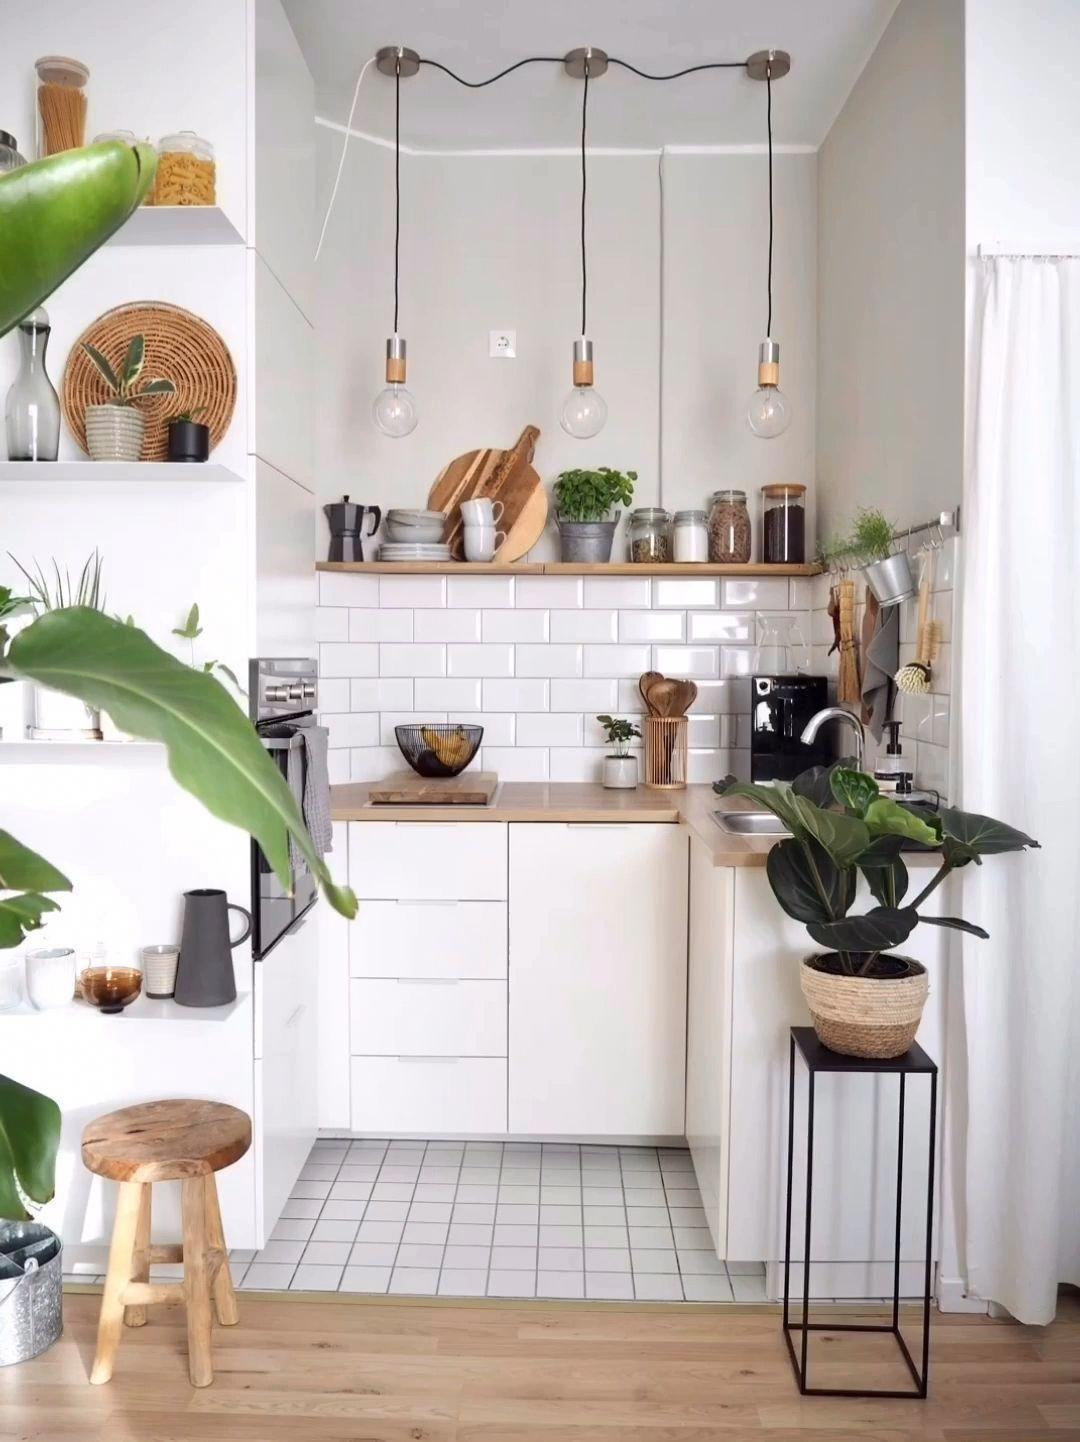 Küche #diy #metro #metrofliesen #kleineküche #kitchenshelvingideas